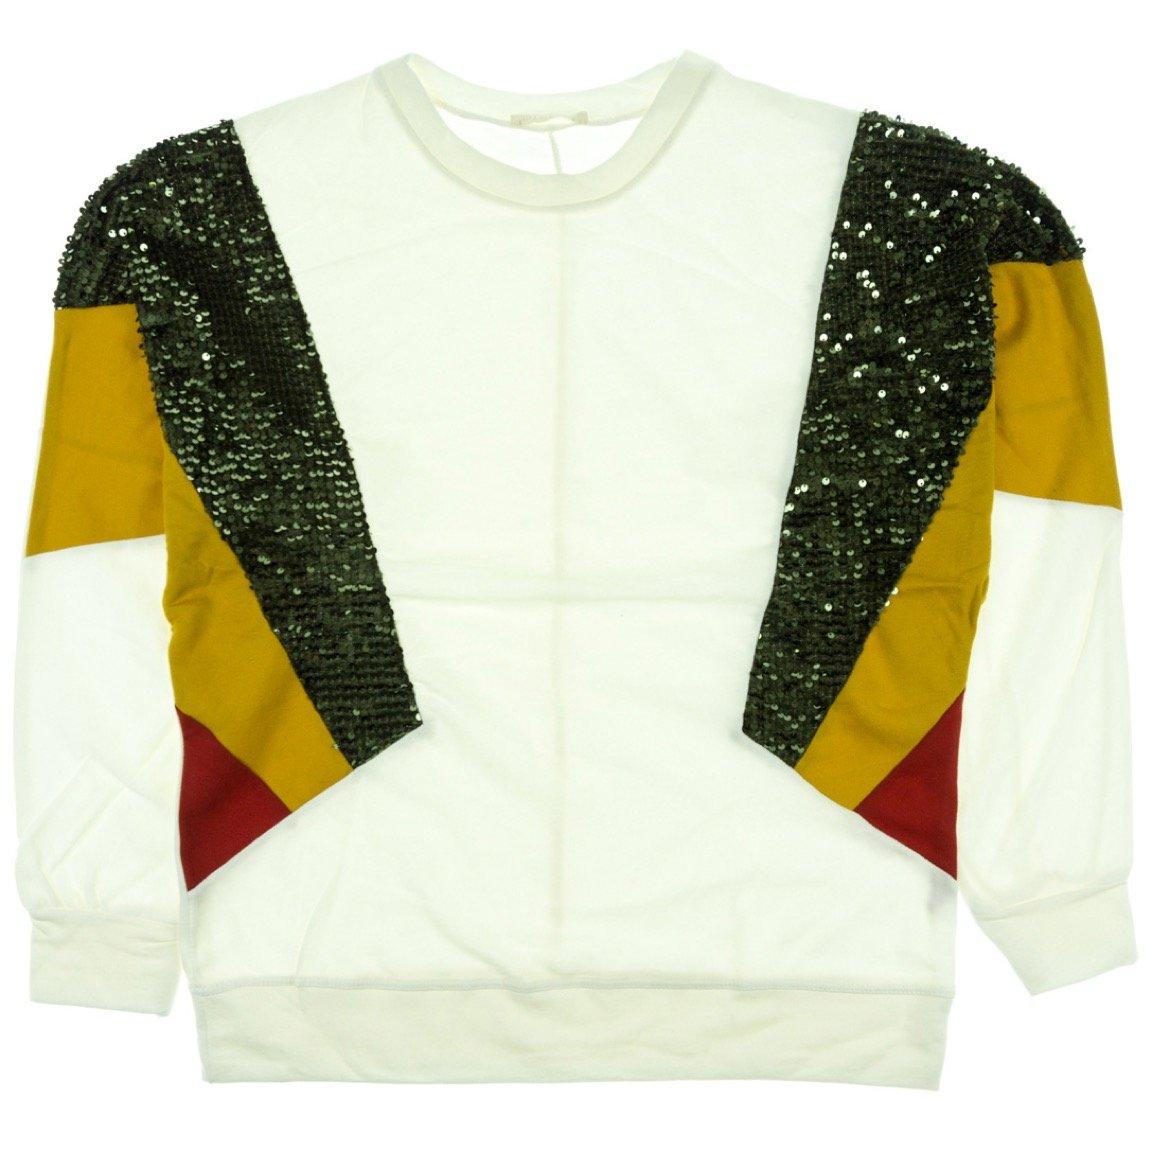 Mint γυναικεία μπλούζα «Sequined White Print»